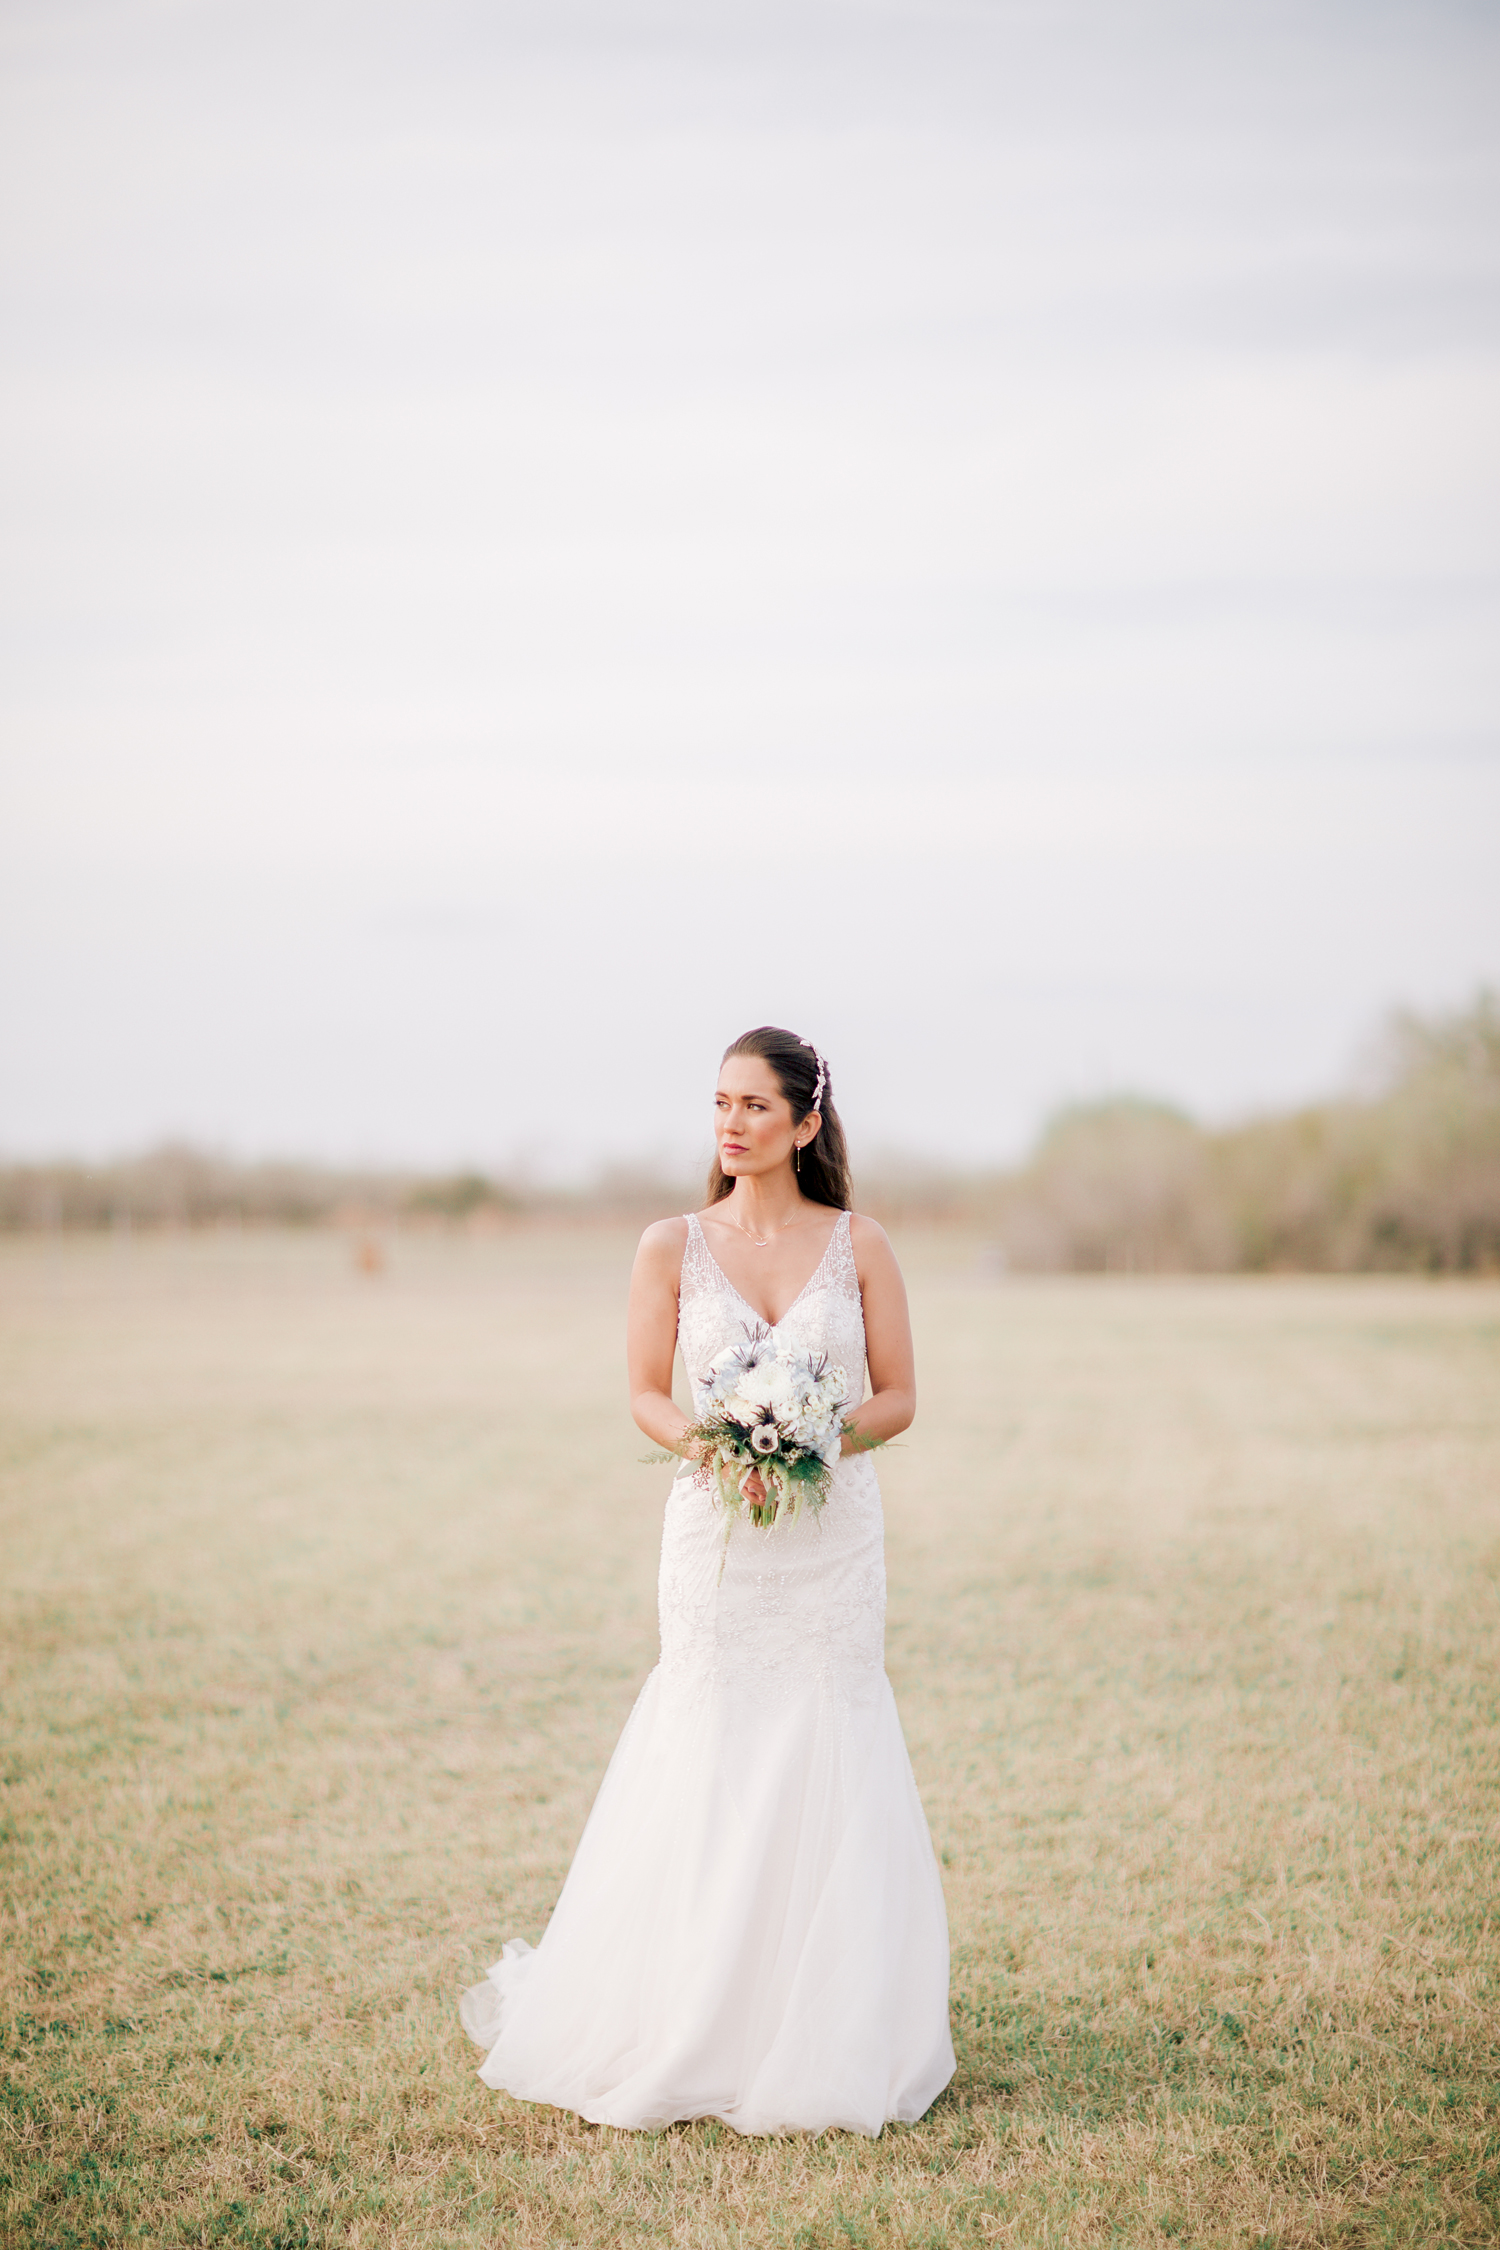 alaa-marzouk-photography-rgvweddingphotographer-rio-grande-valley-mathis-wedding-bridal-bride-san-antonio-portrait-weddings-mcallen-123.jpg